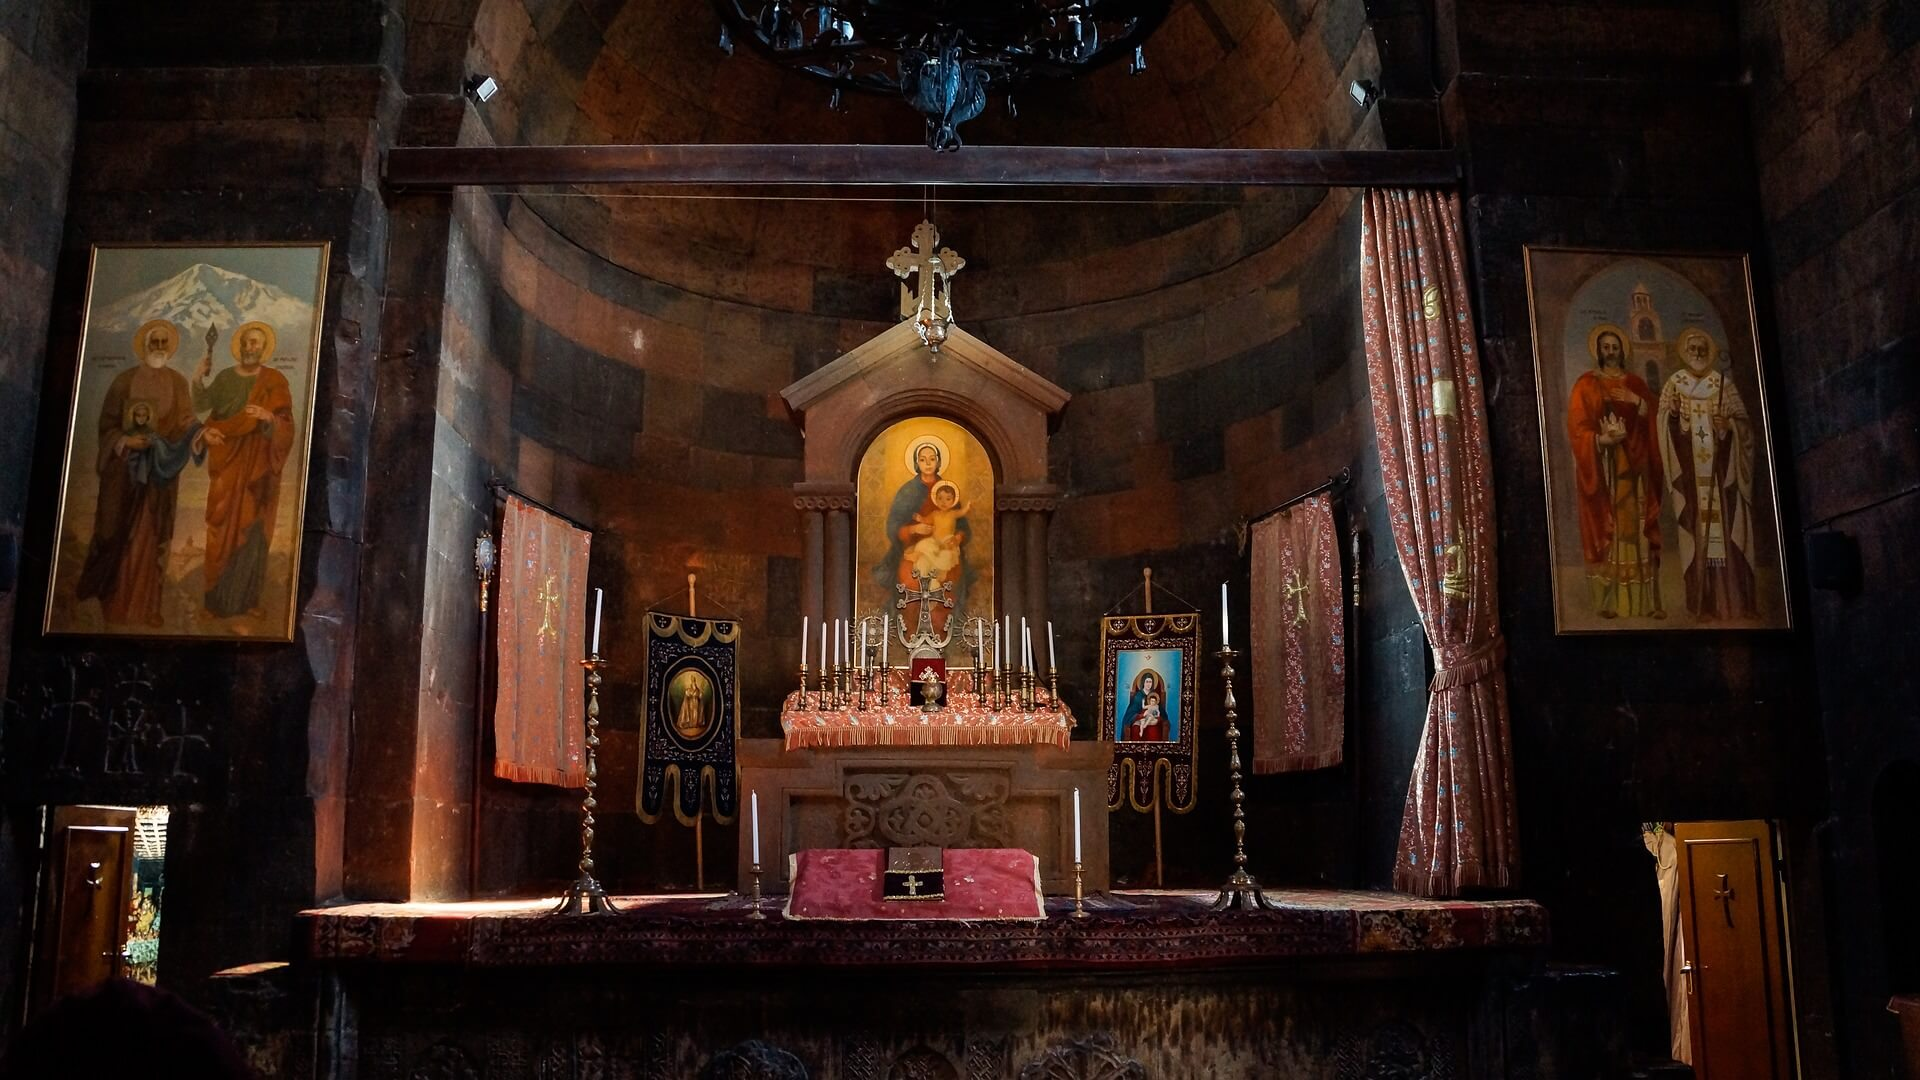 Kapel in het klooster van Khor Virap in Armenië